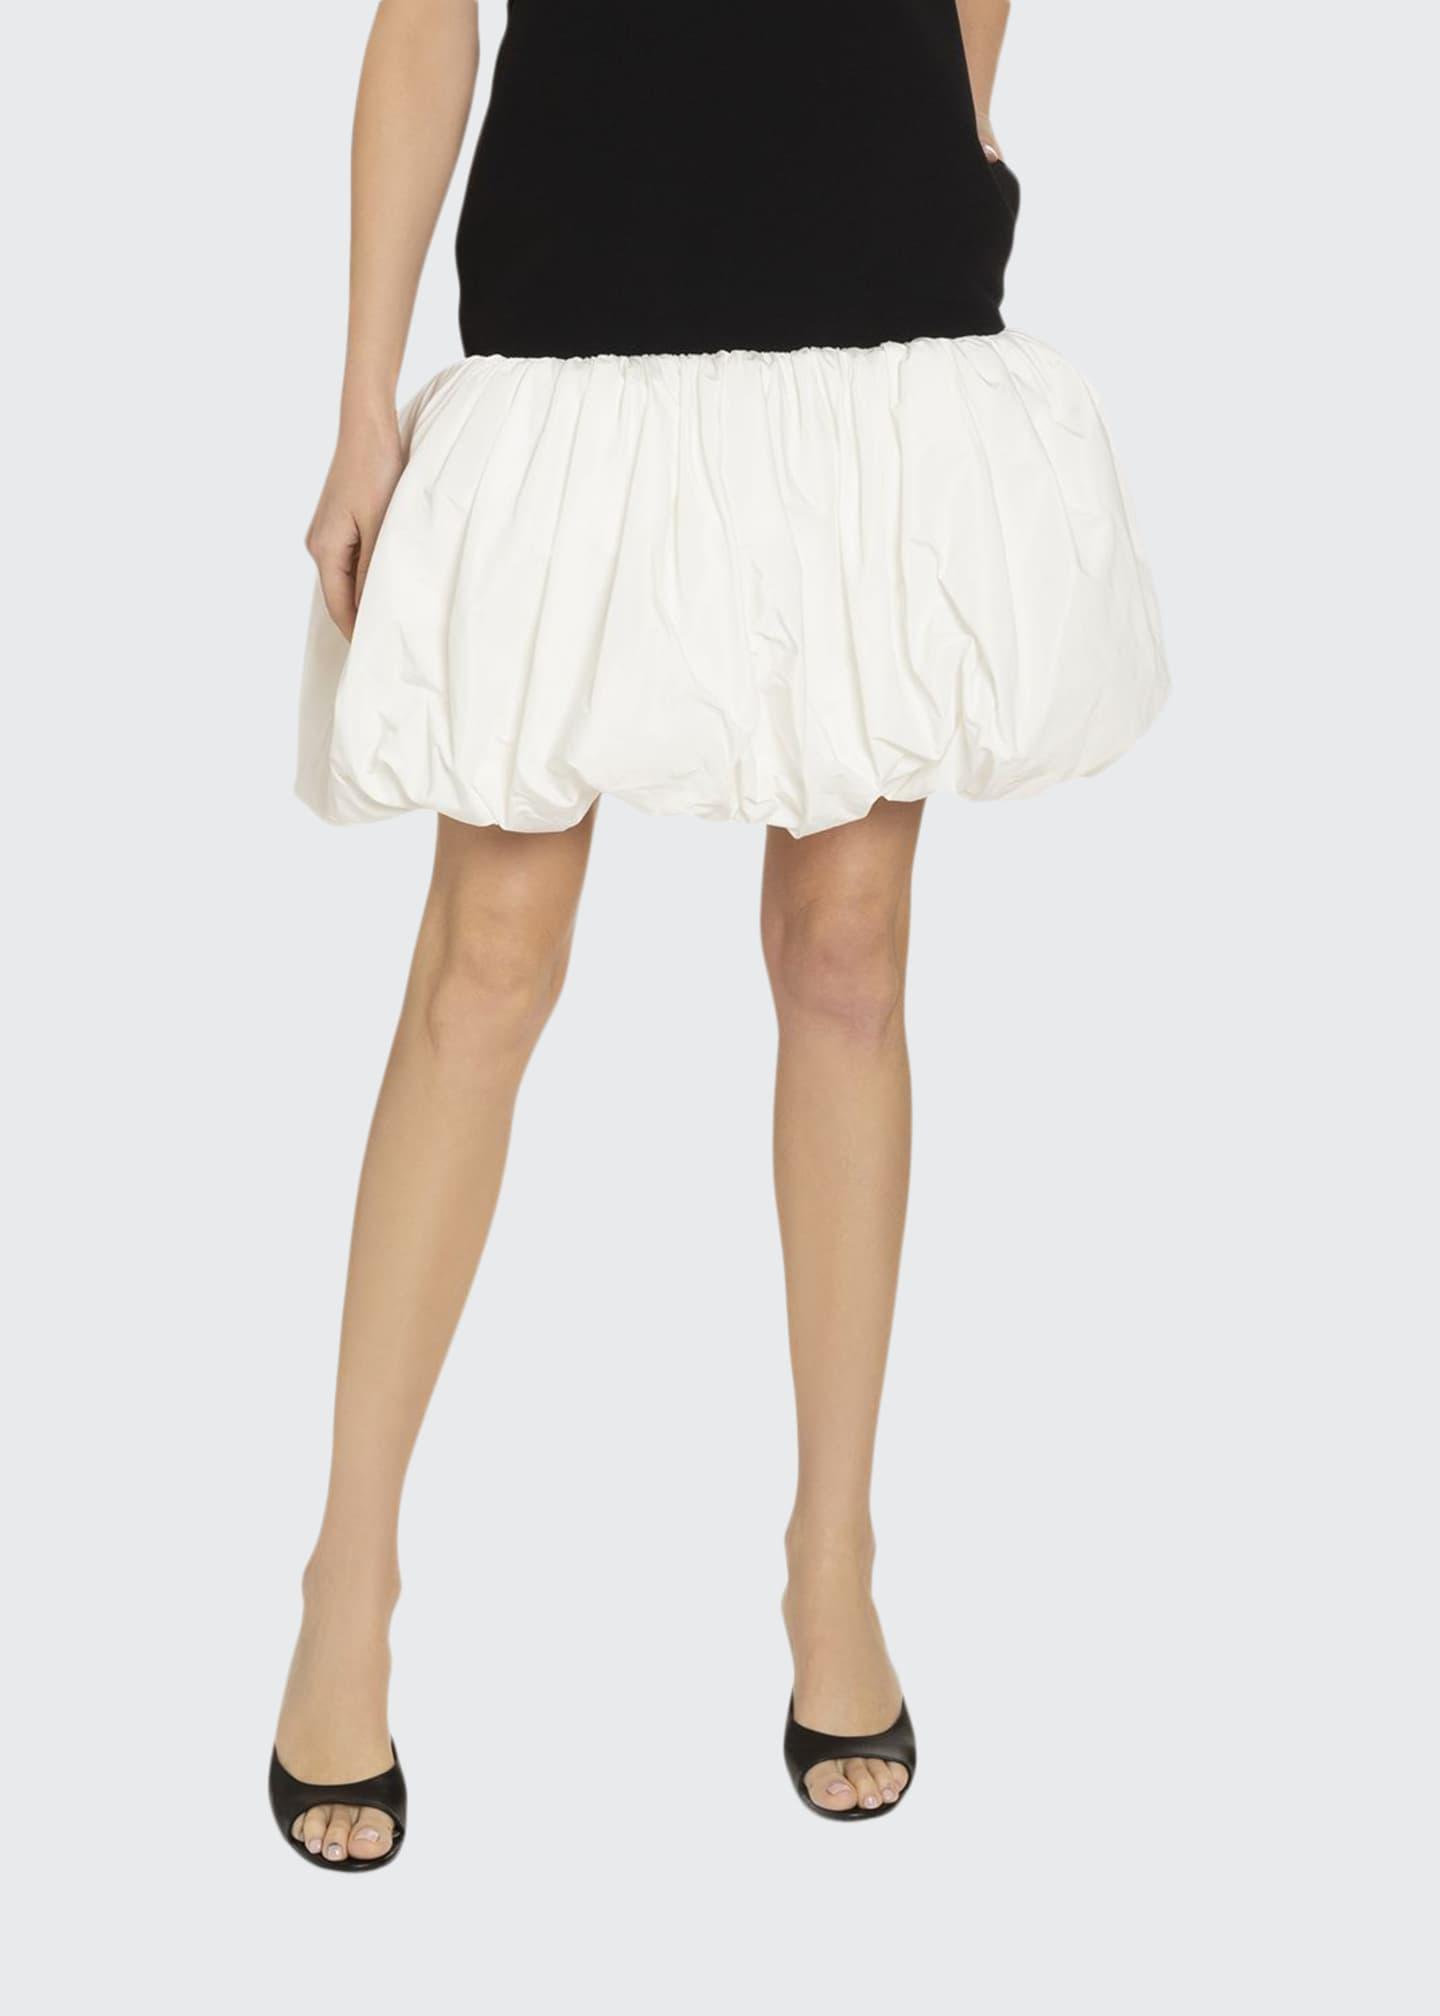 Givenchy Taffeta Balloon-Skirted Dress